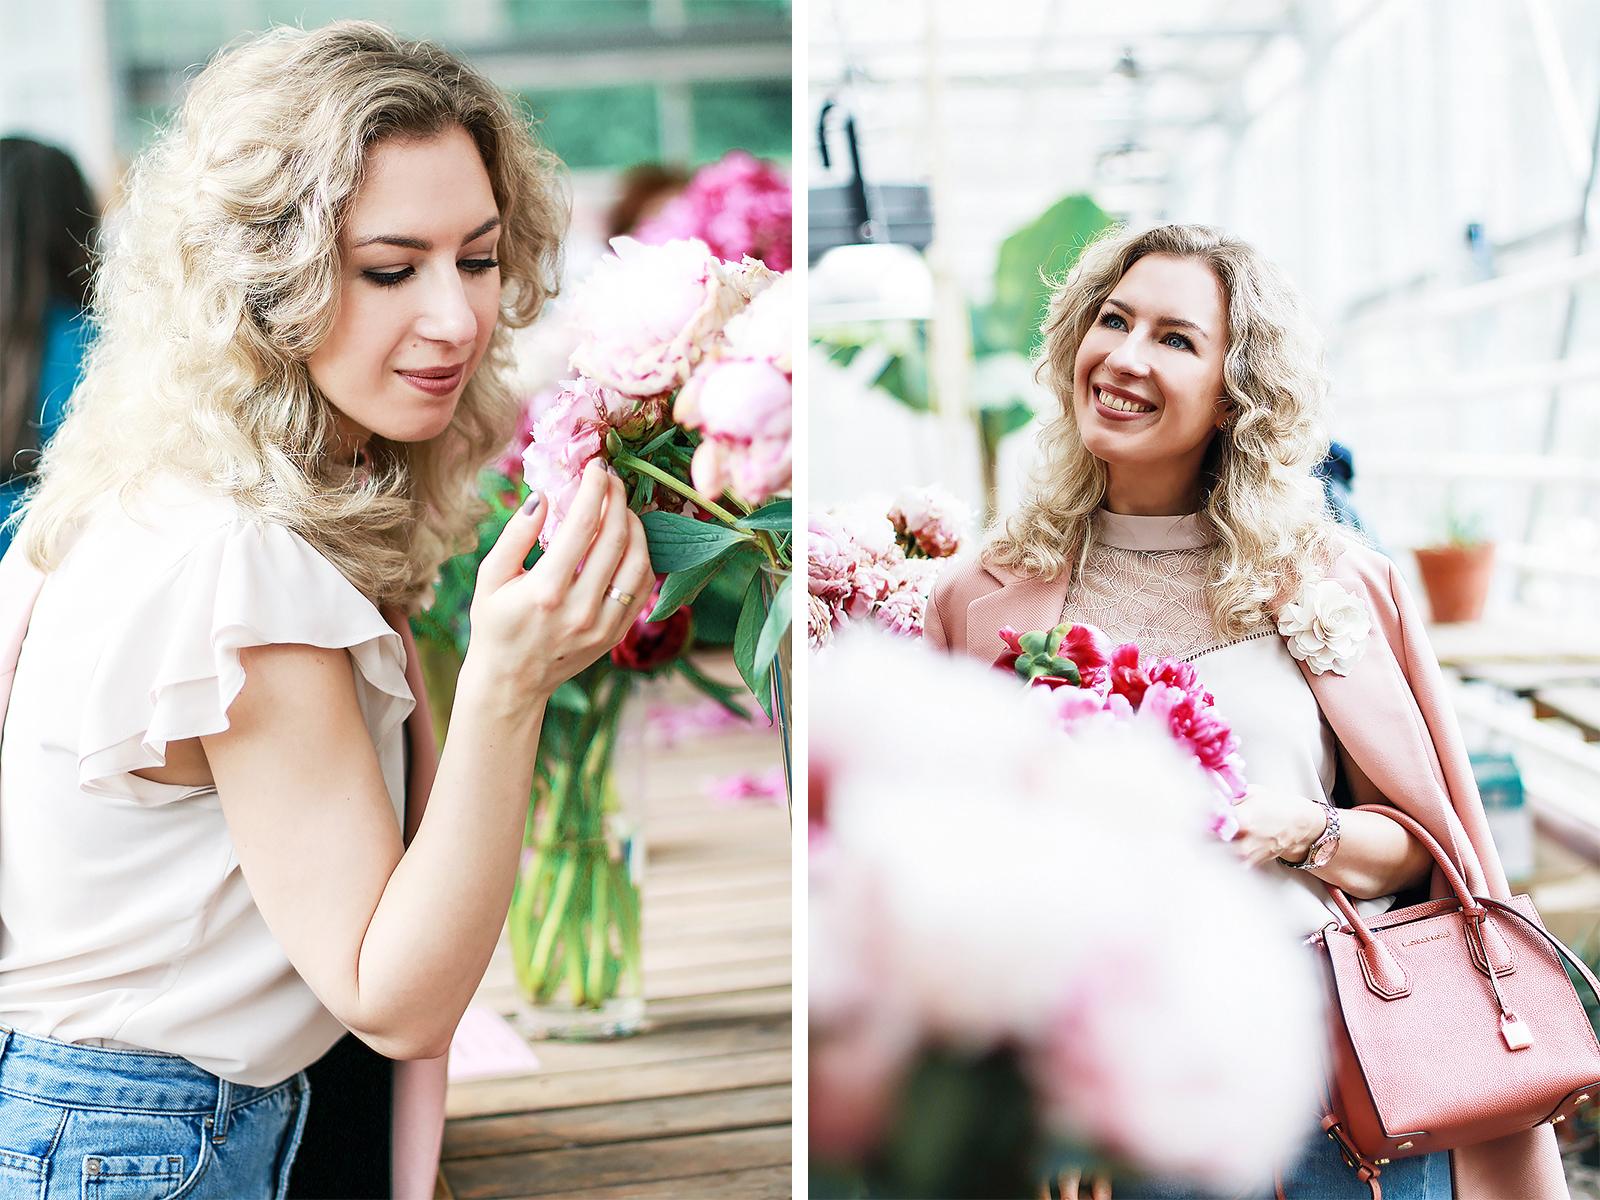 peony_garden_ritalifestyle_pink_zara_coat_mom_jeans_flowers_curly_ruffles_trend_2017